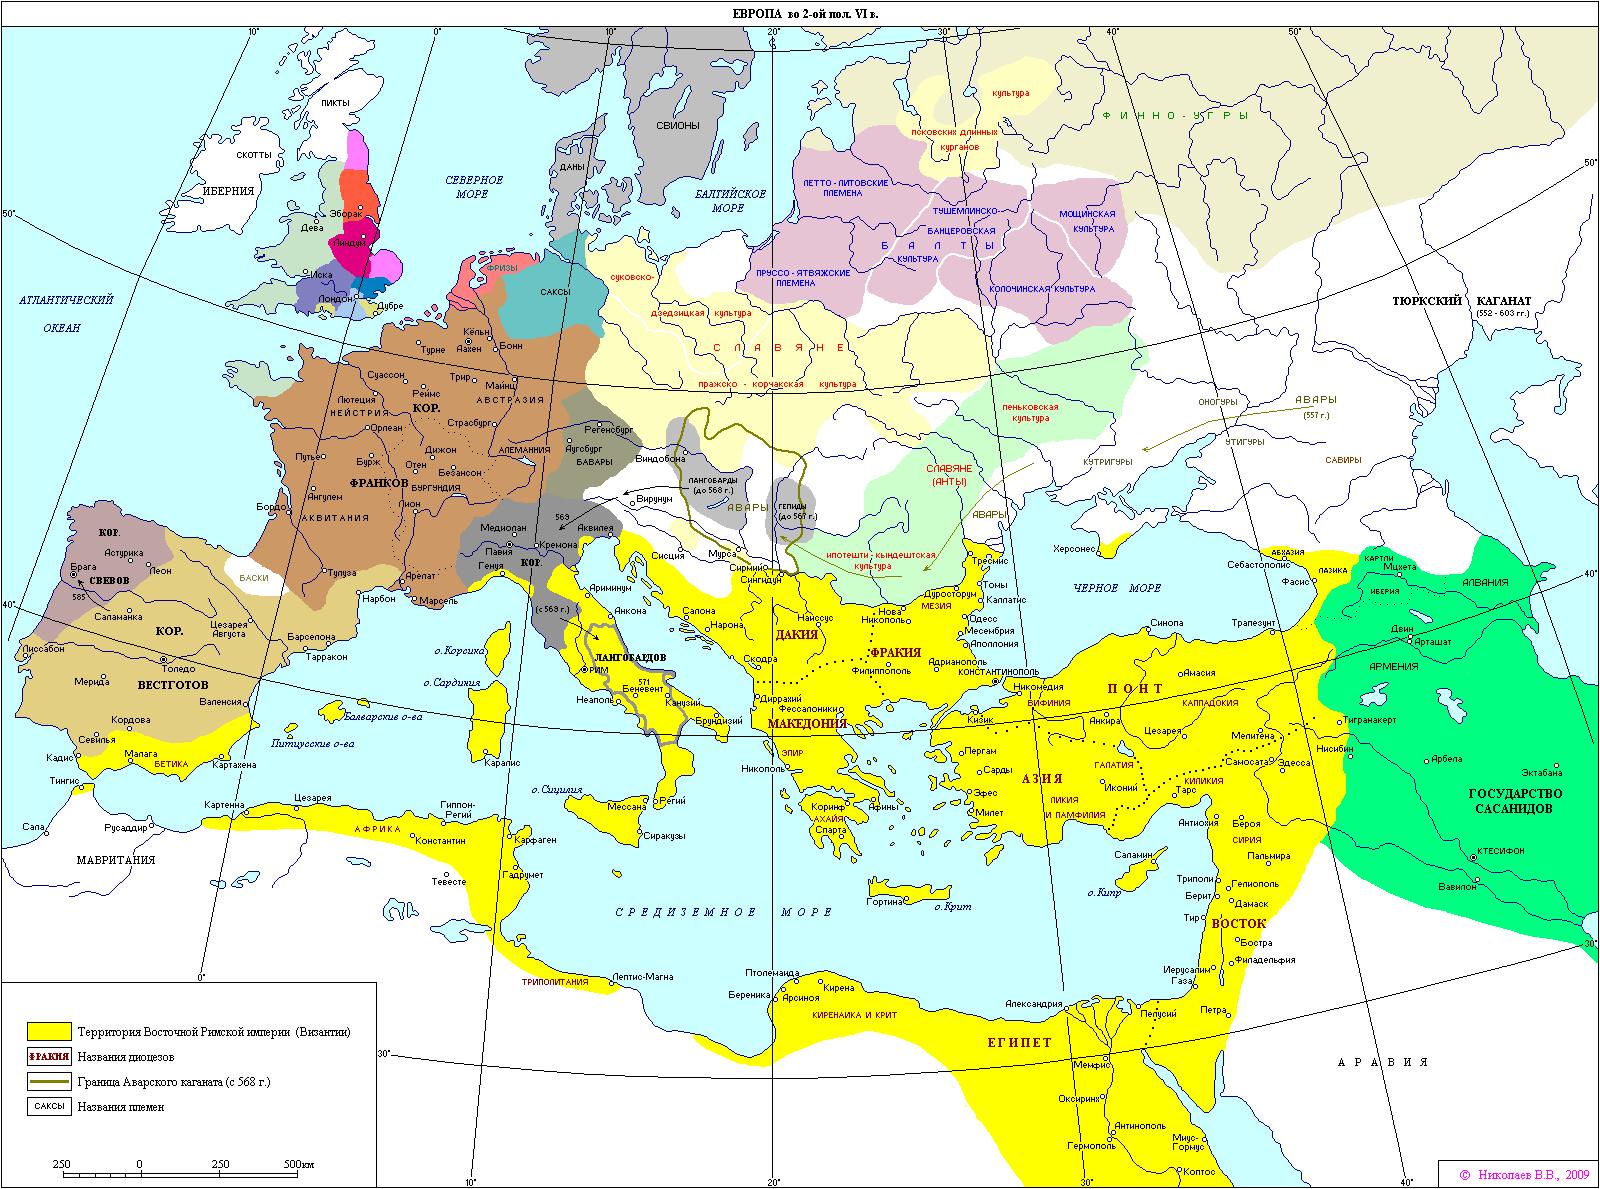 014-europe550-600